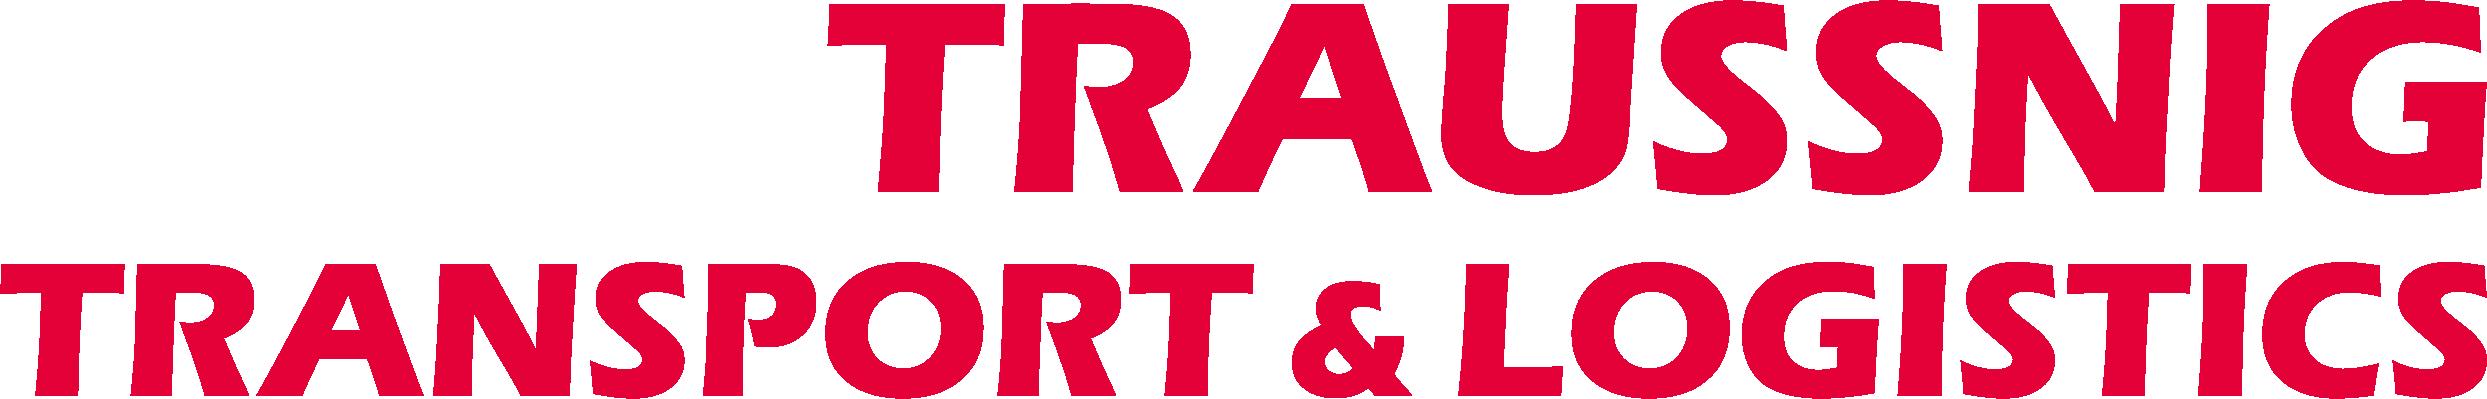 TRAUSSNIG Spedition GmbH